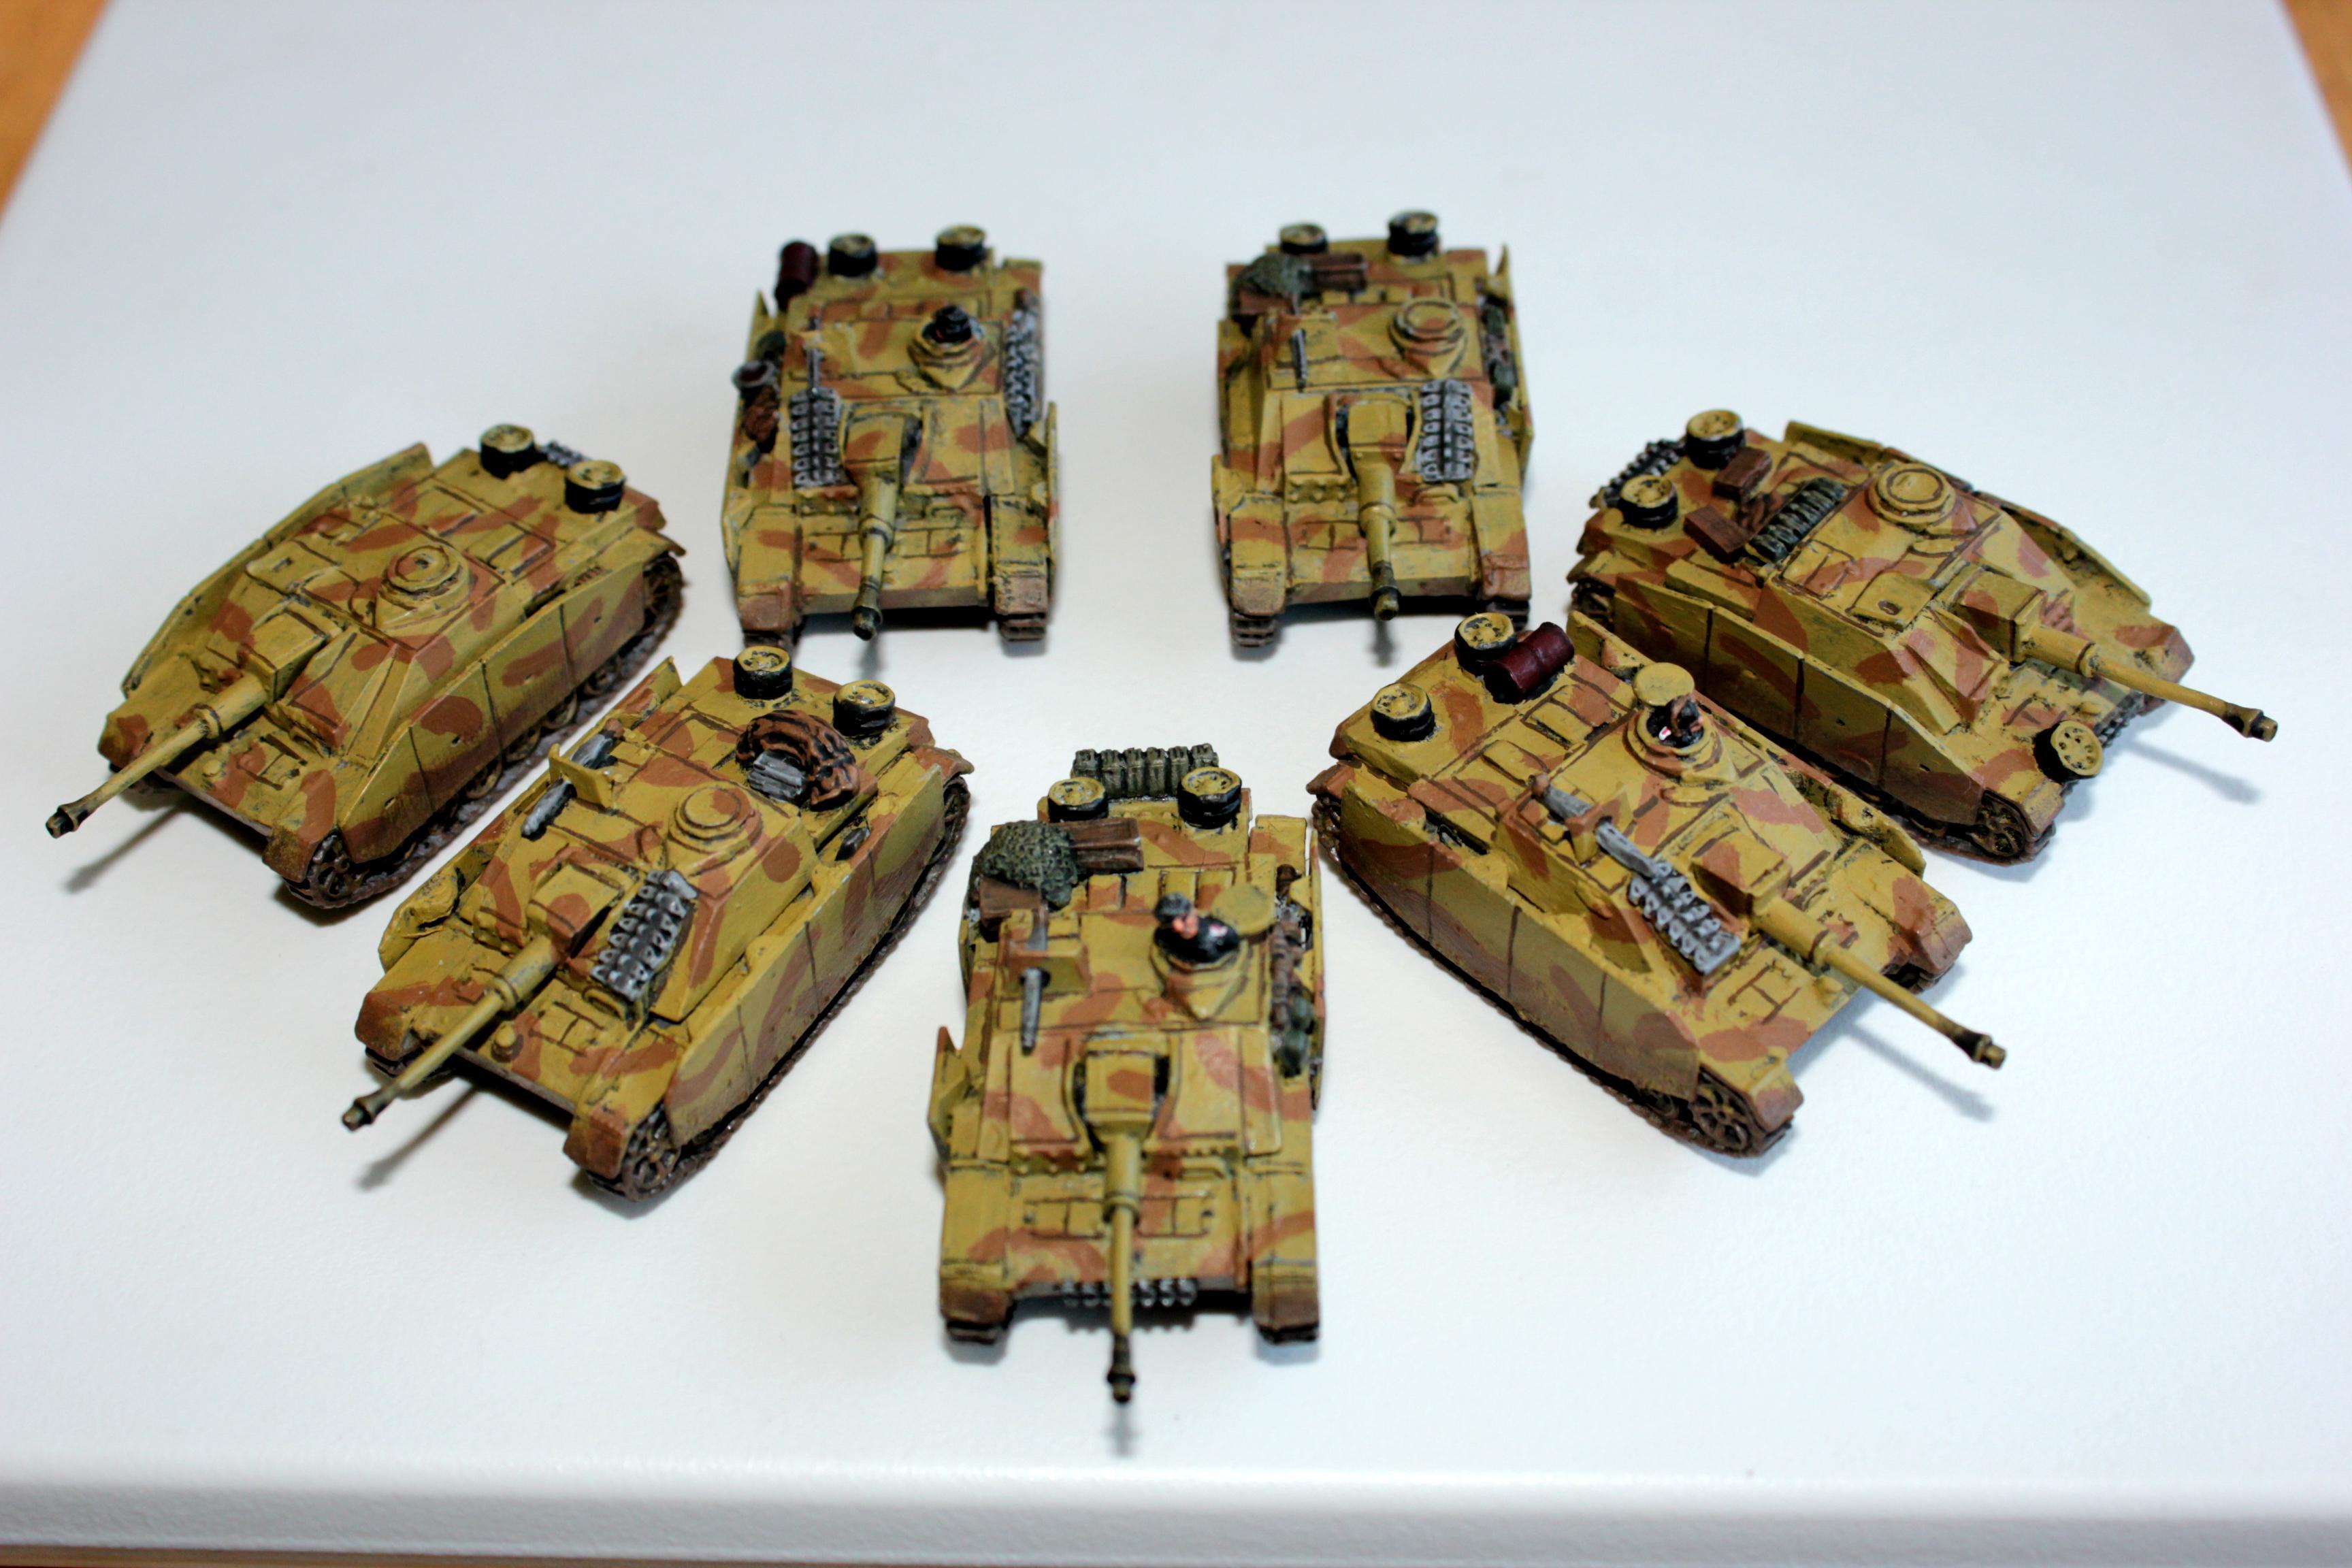 Flames Of War, Germans, Jagdtiger, King Tiger, Kt, Late War, Lw, Panzer, Stug, Stug Iii G, Stuh, Stuh42, Tank, World War 2